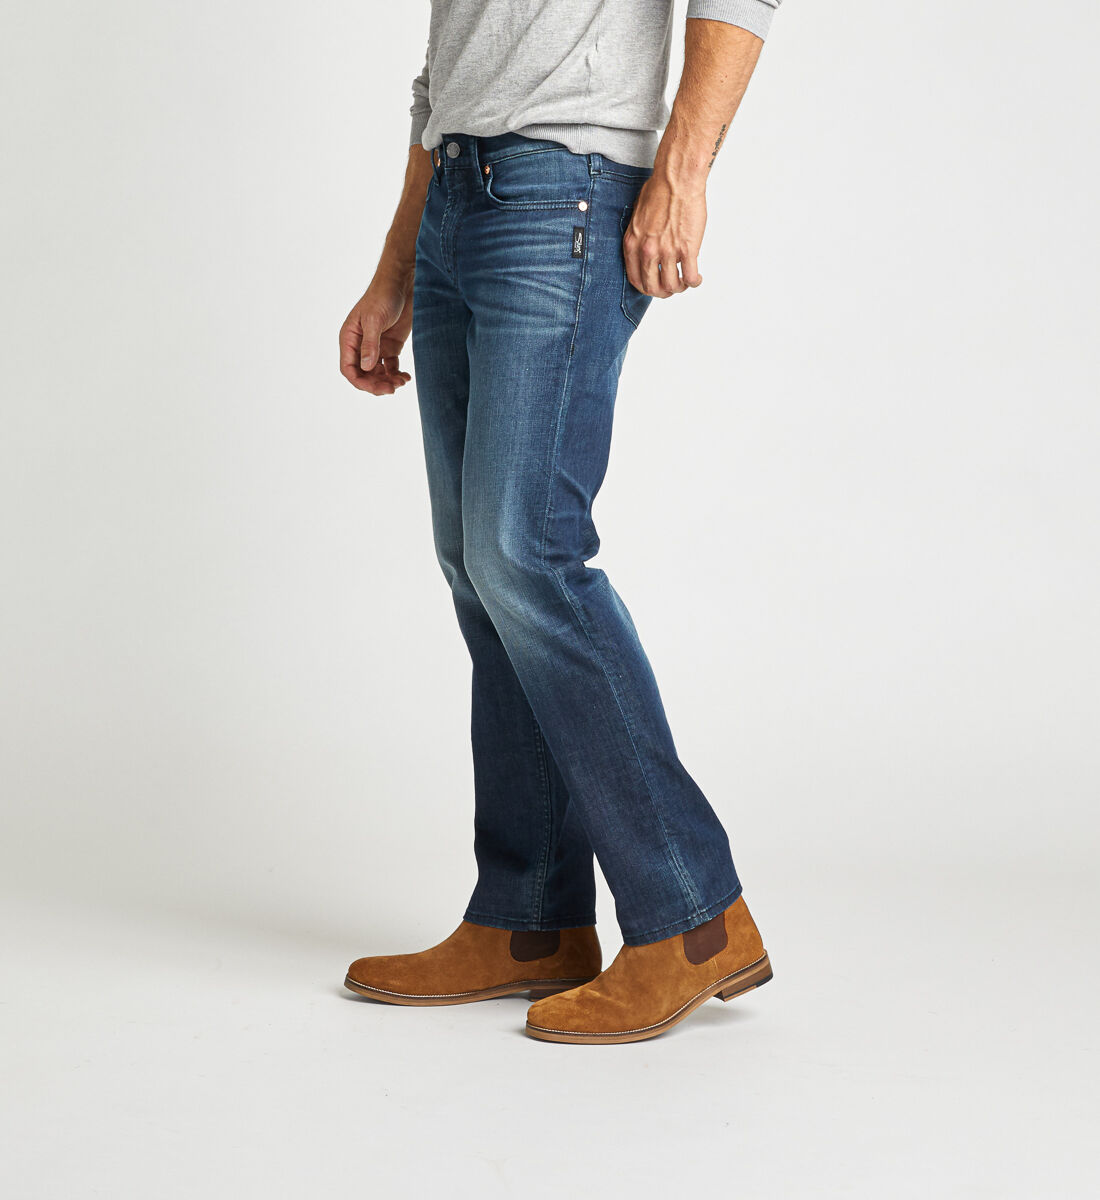 Konrad Slim Fit Slim Leg Jeans Side